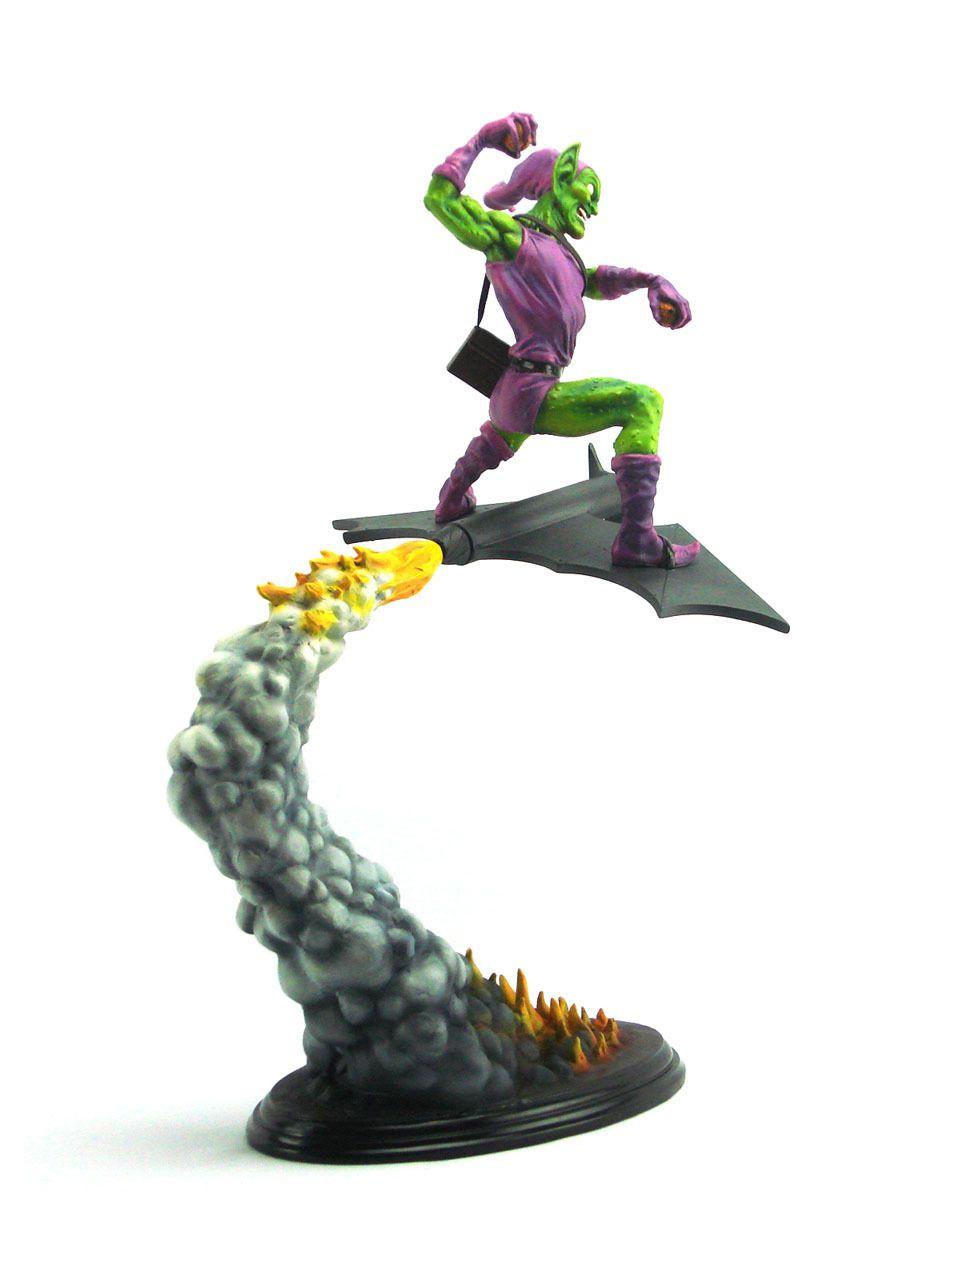 Estátua Duende Verde (Green Goblin): Marvel Comics (Painted Statue Erick Sosa Version) - Bowen Designs